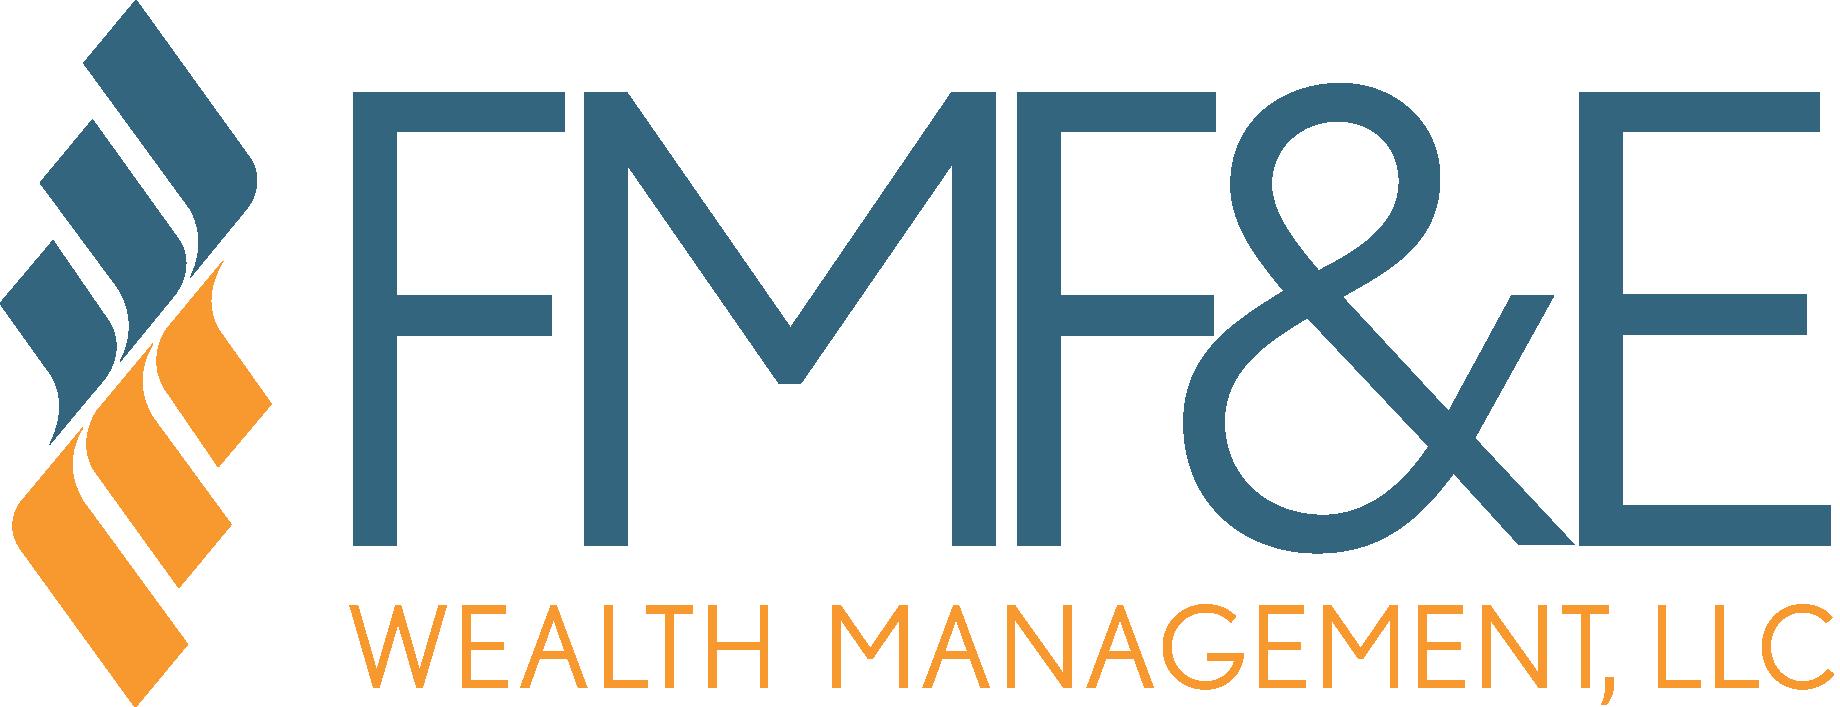 FMF&E_logo_color.png